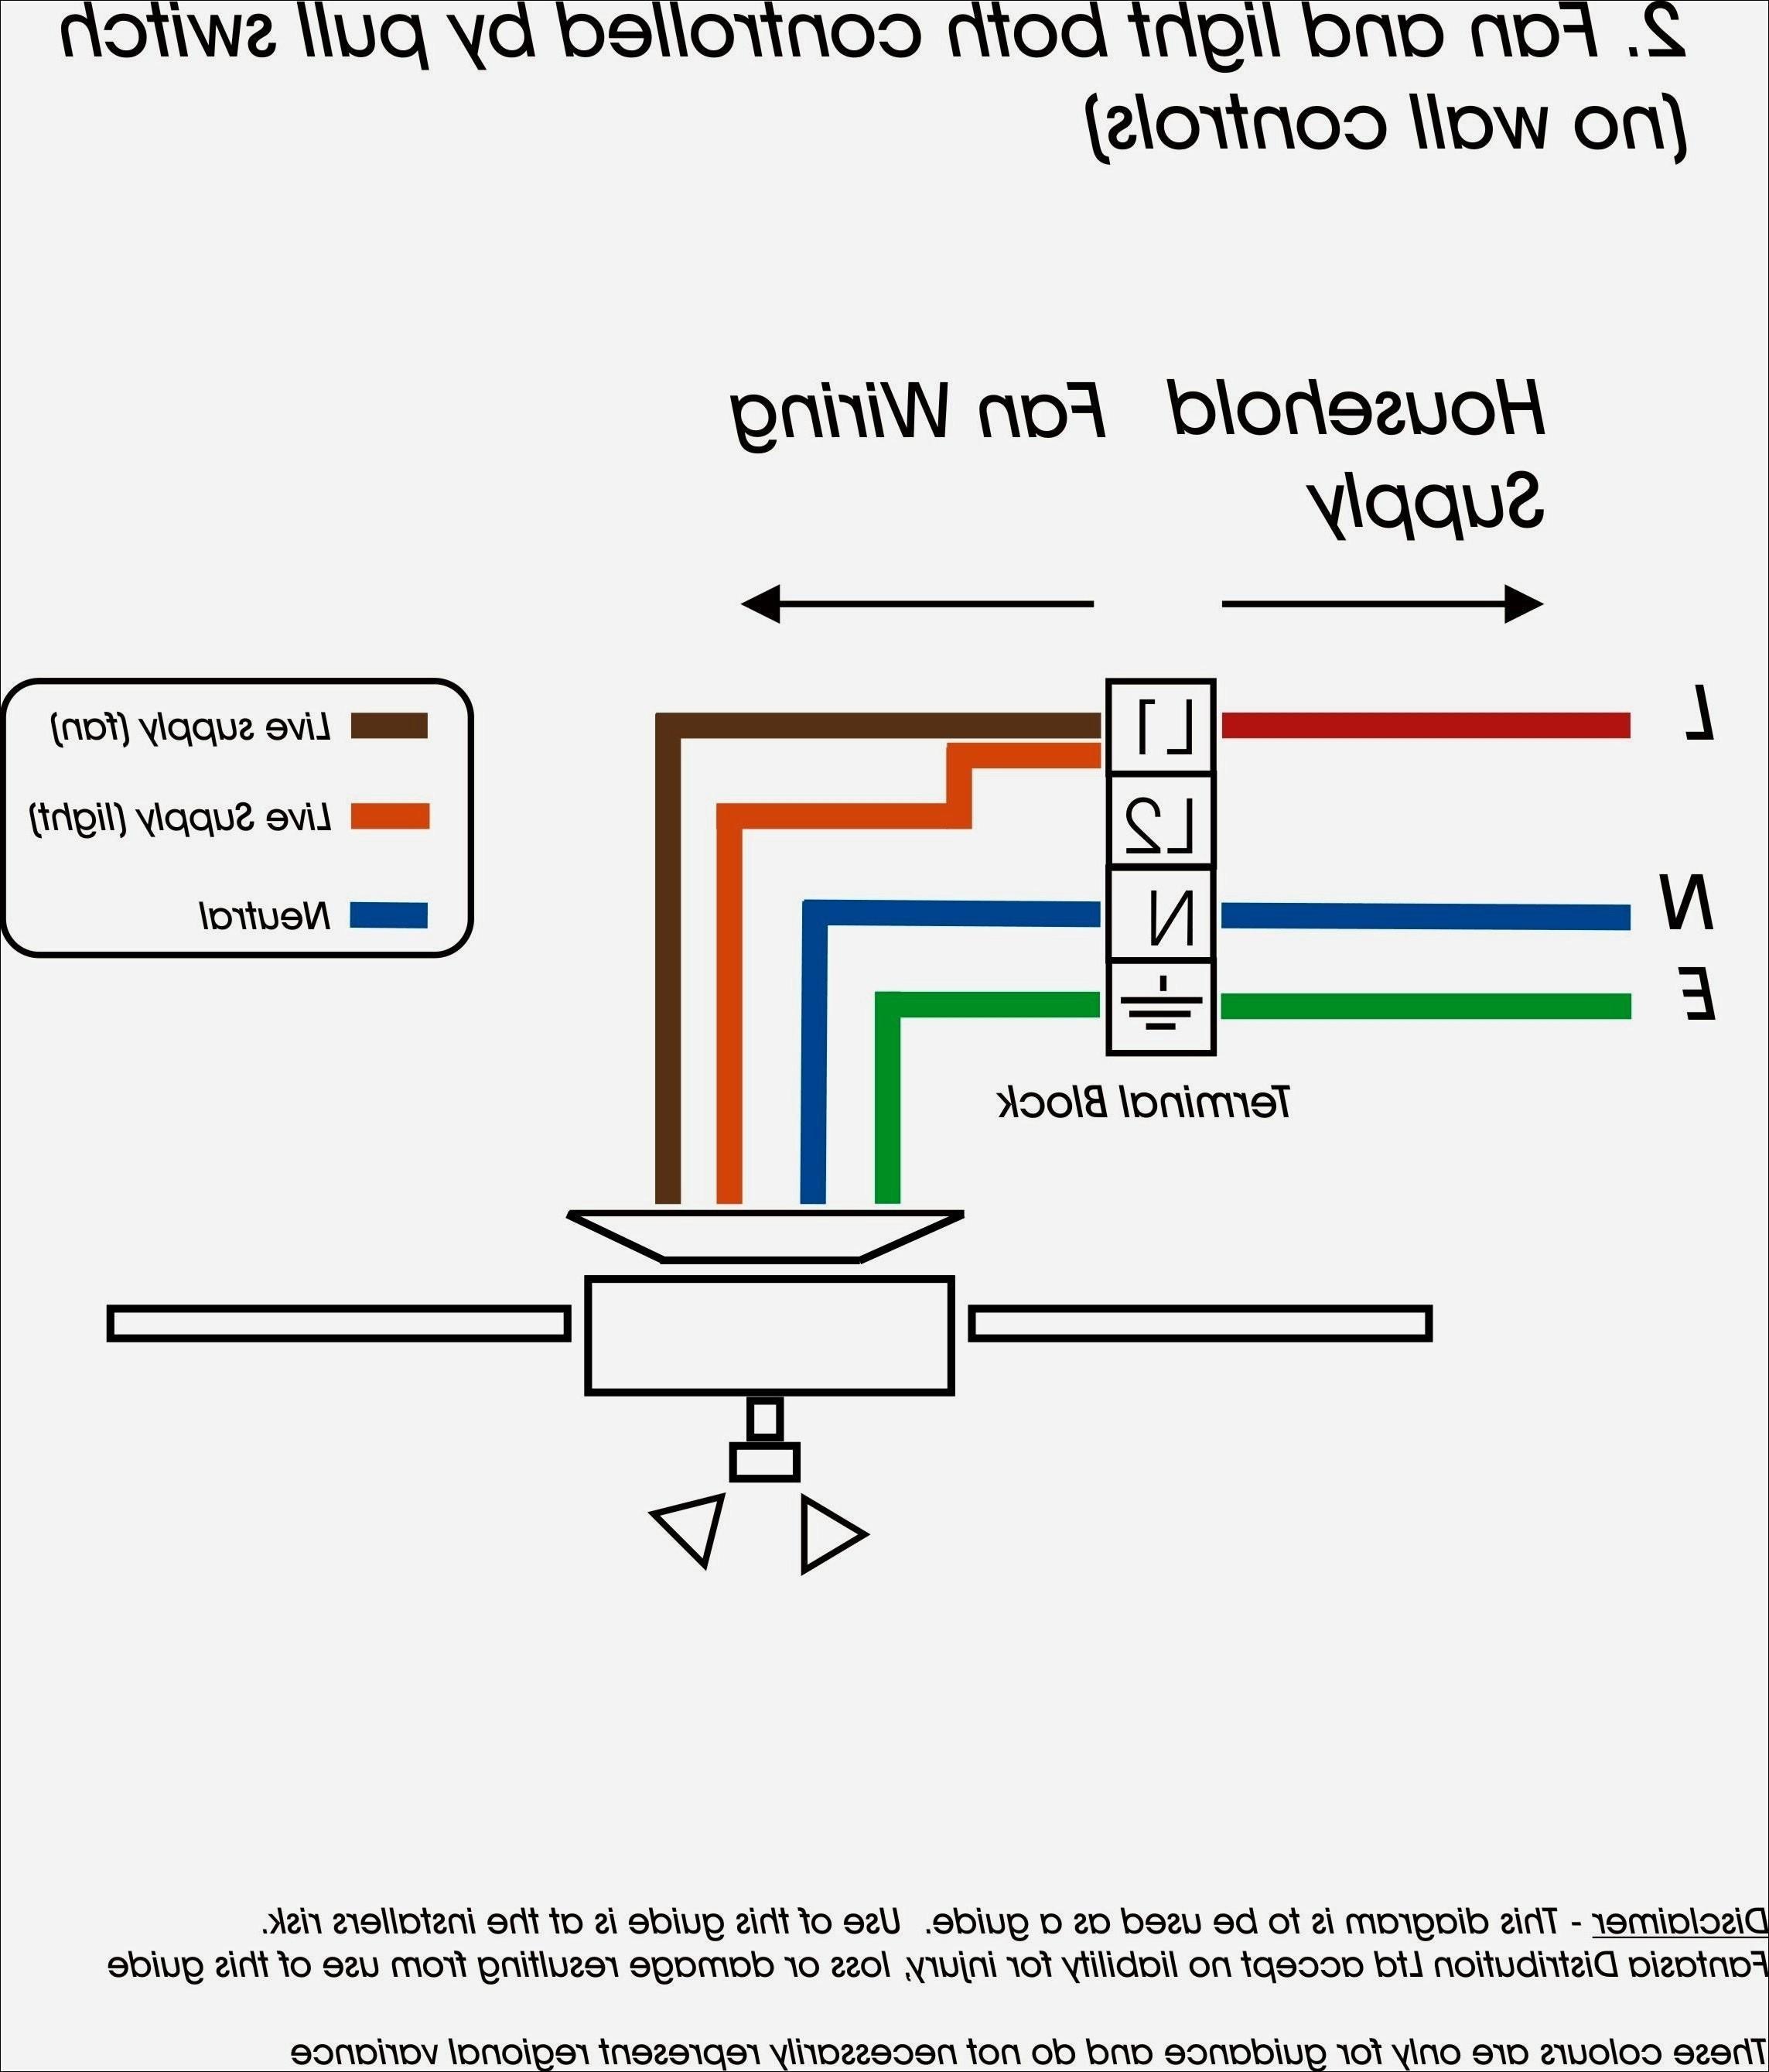 Lutron Maestro Cl Wiring Diagram Rate Lutron Diva 3 Way Dimmer - Lutron Dimmer Wiring Diagram